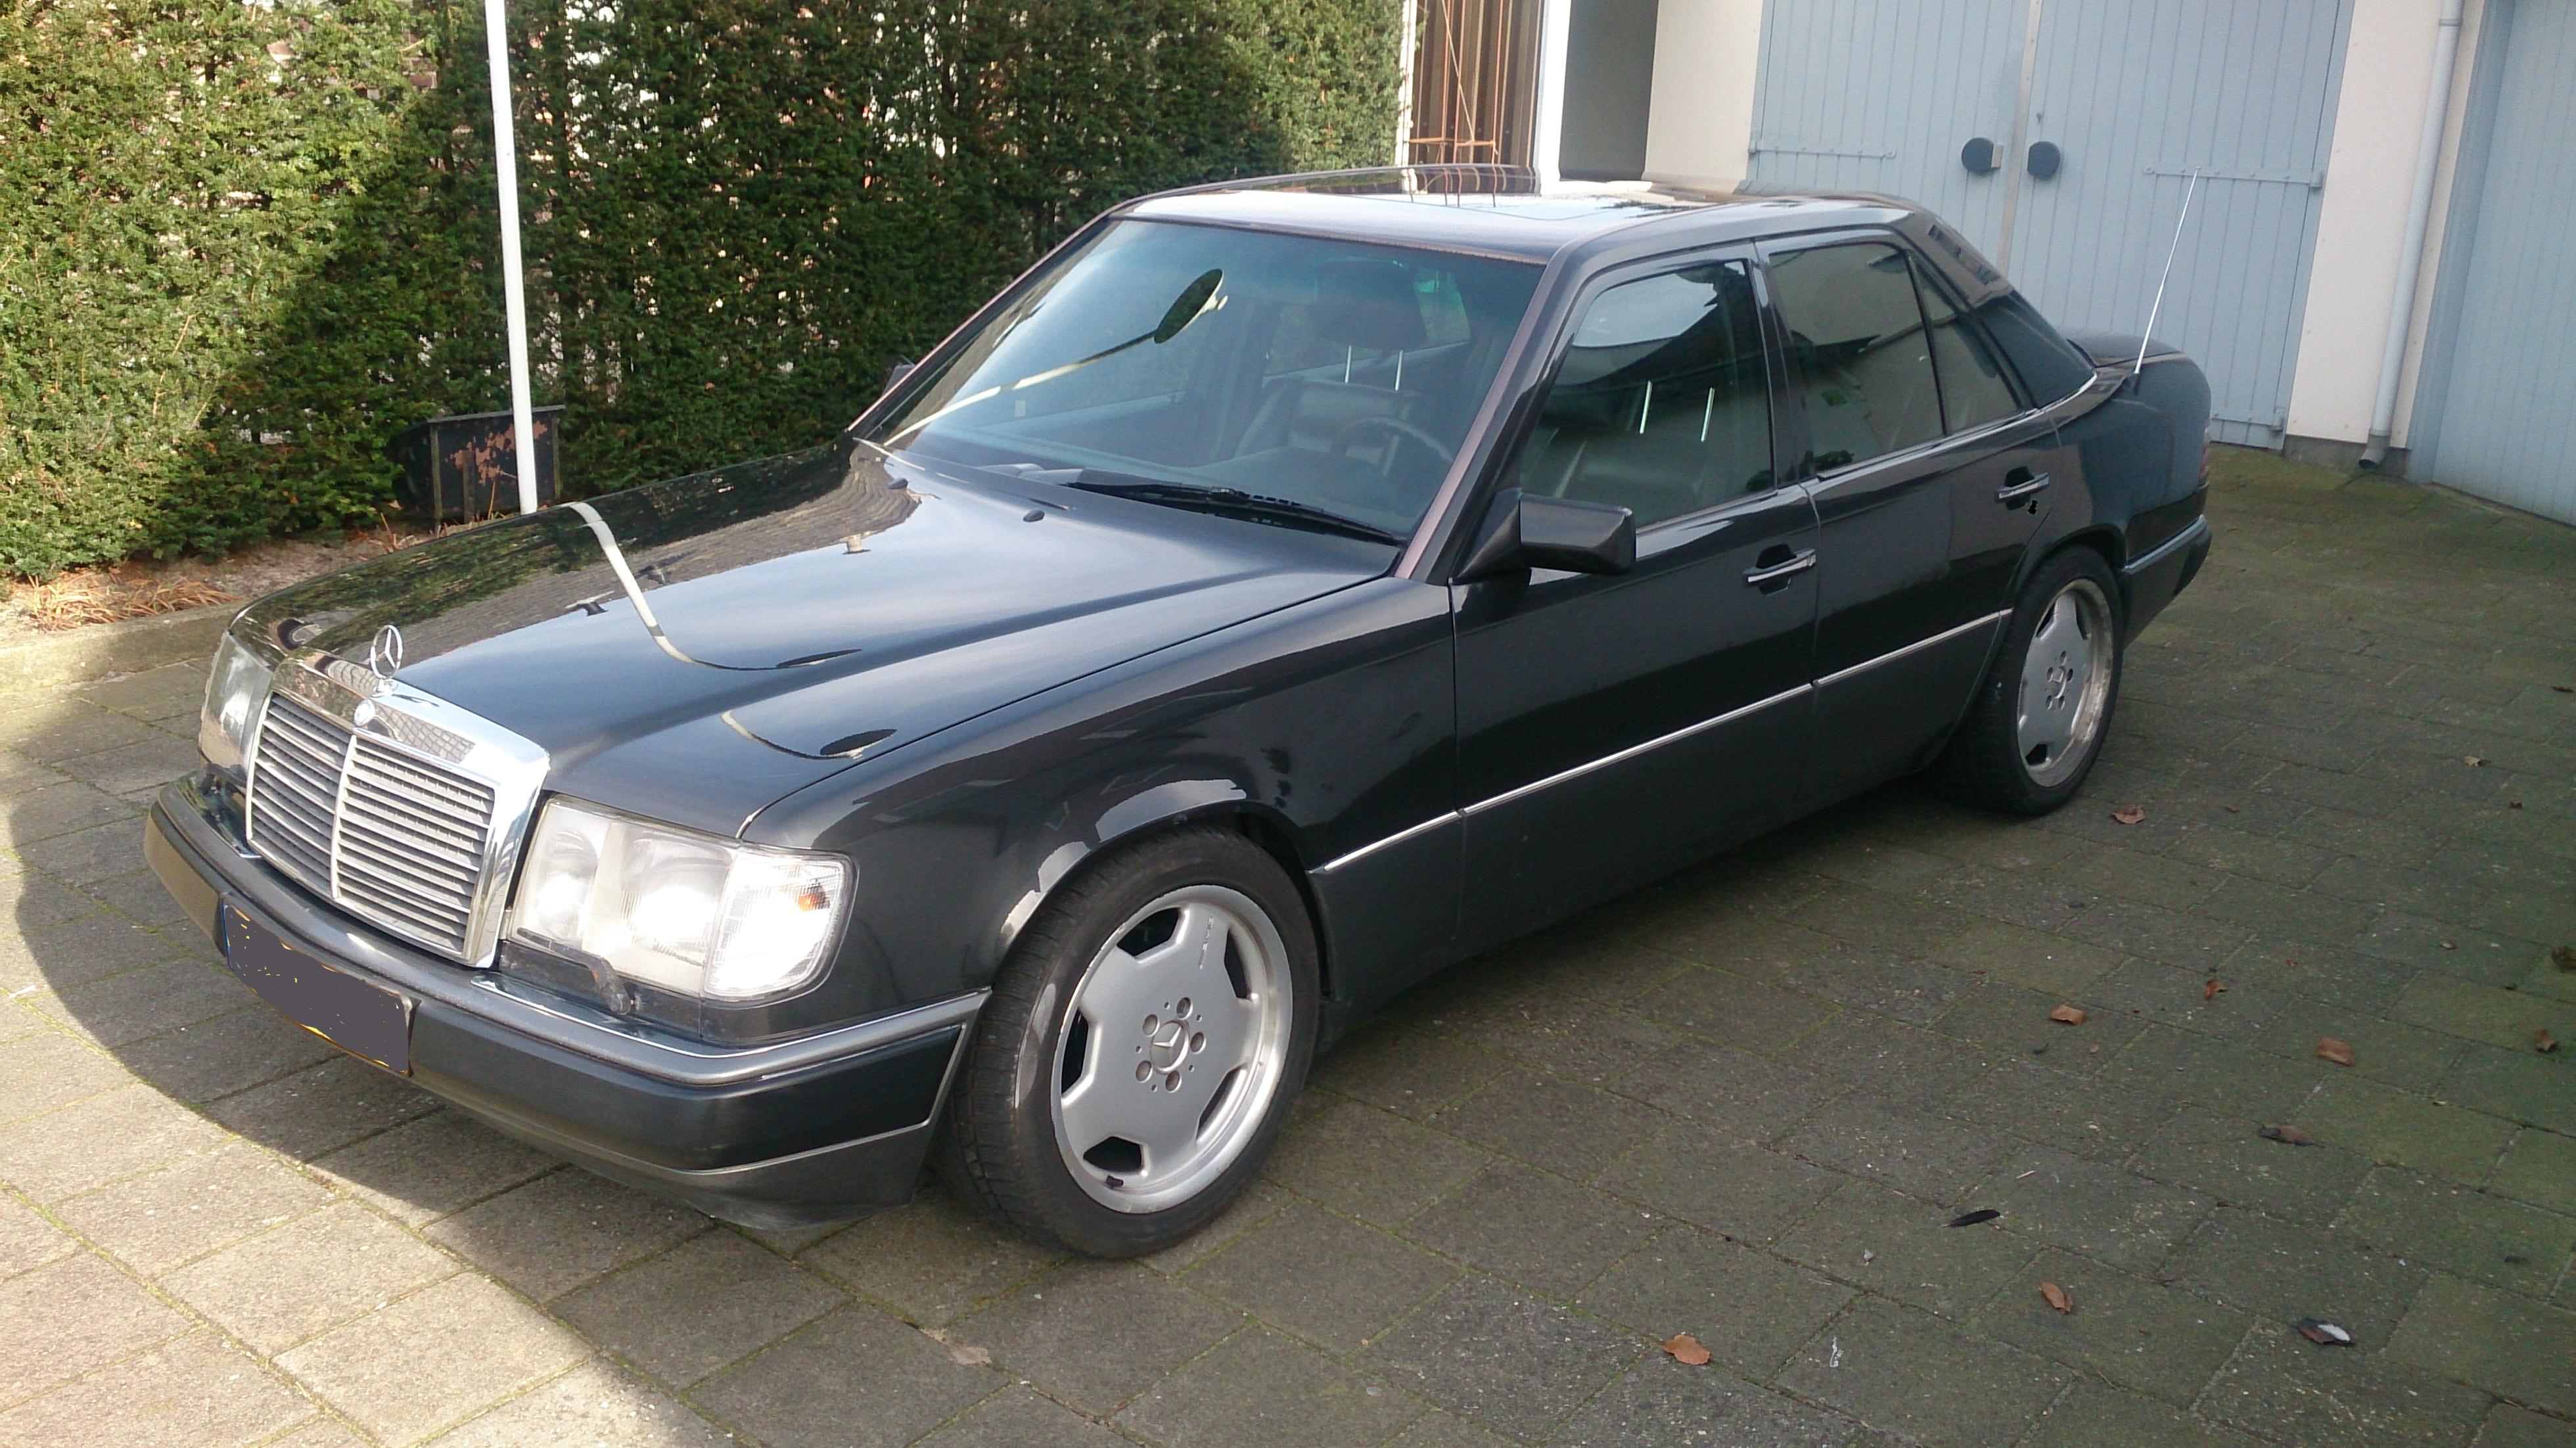 1986 mercedes benz 300e 24v amg for Mercedes benz 1986